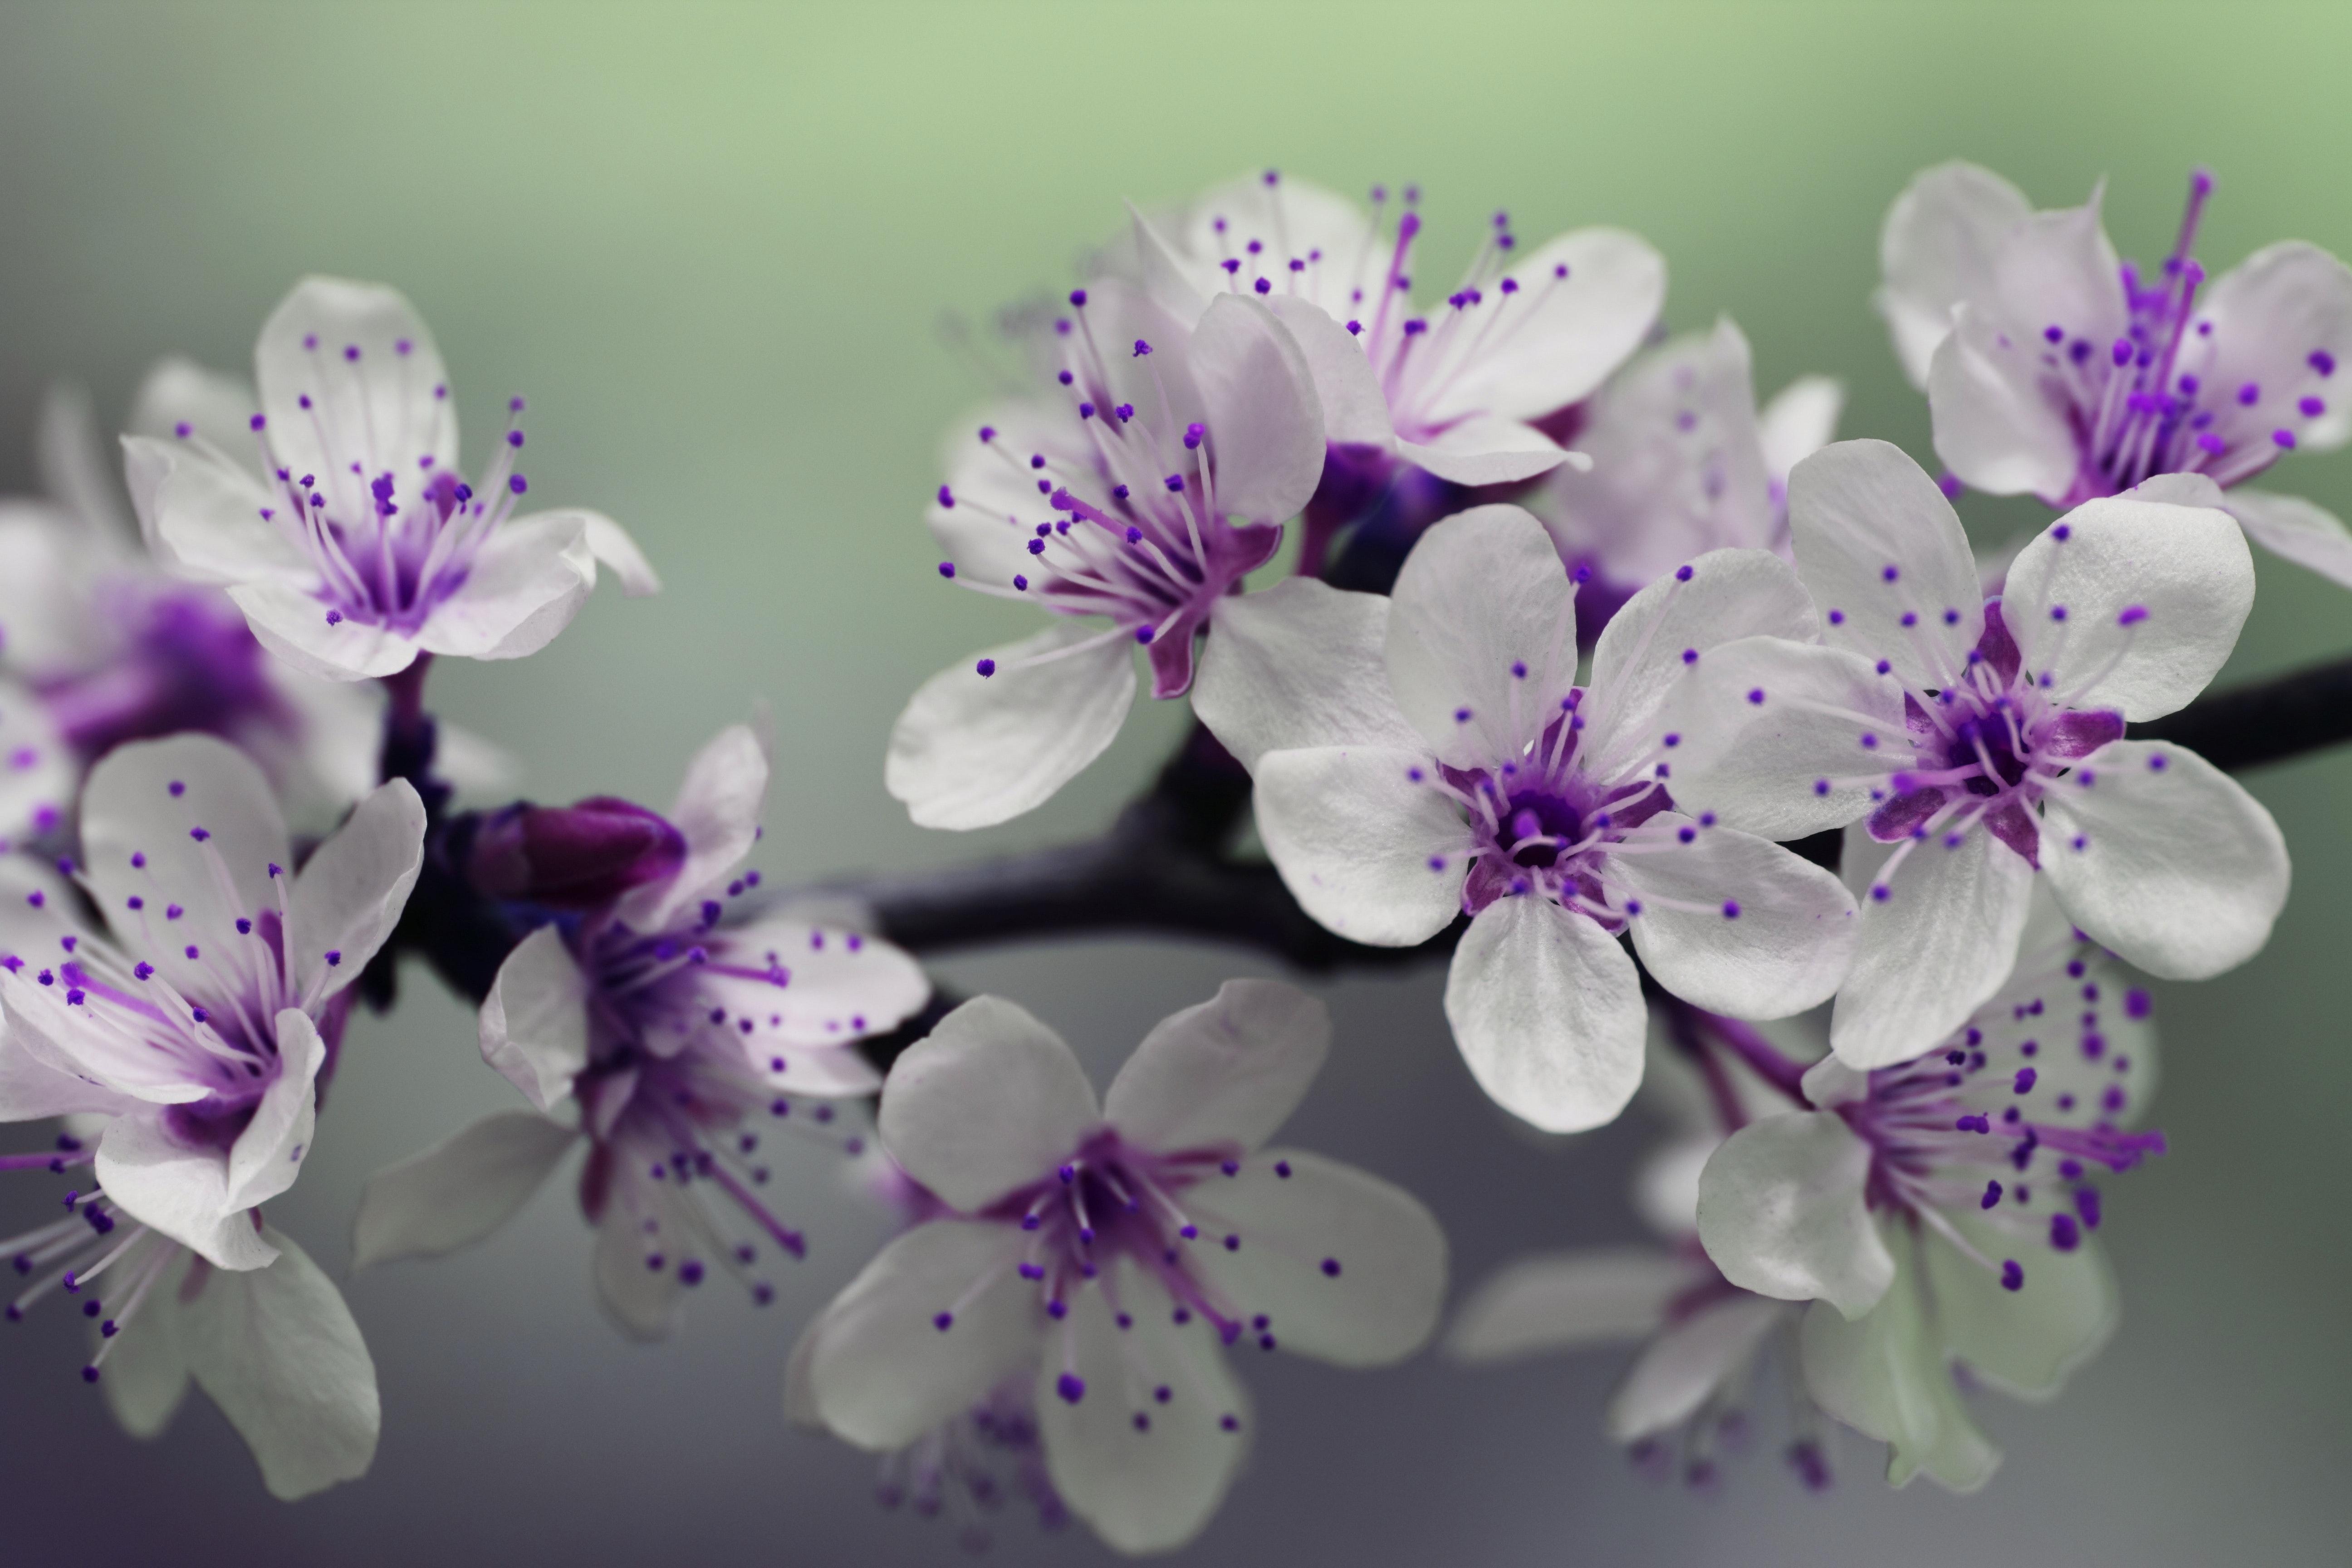 Flower images pexels free stock photos fetching more photos izmirmasajfo